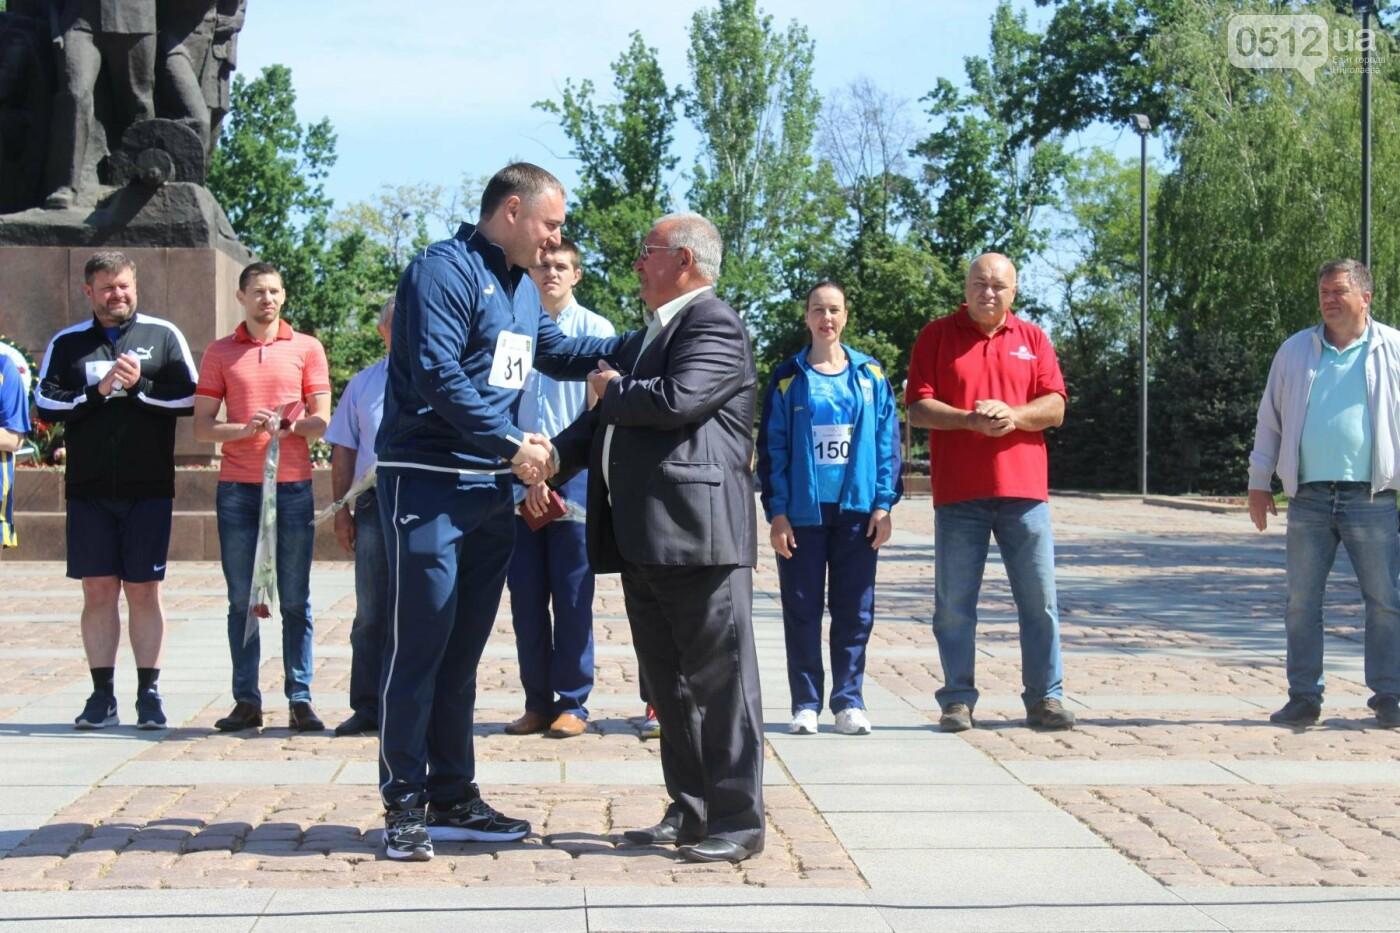 В Николаеве на день олимпийца спортсменам вручили награды и ключи от нового автобуса, - ФОТО , фото-7